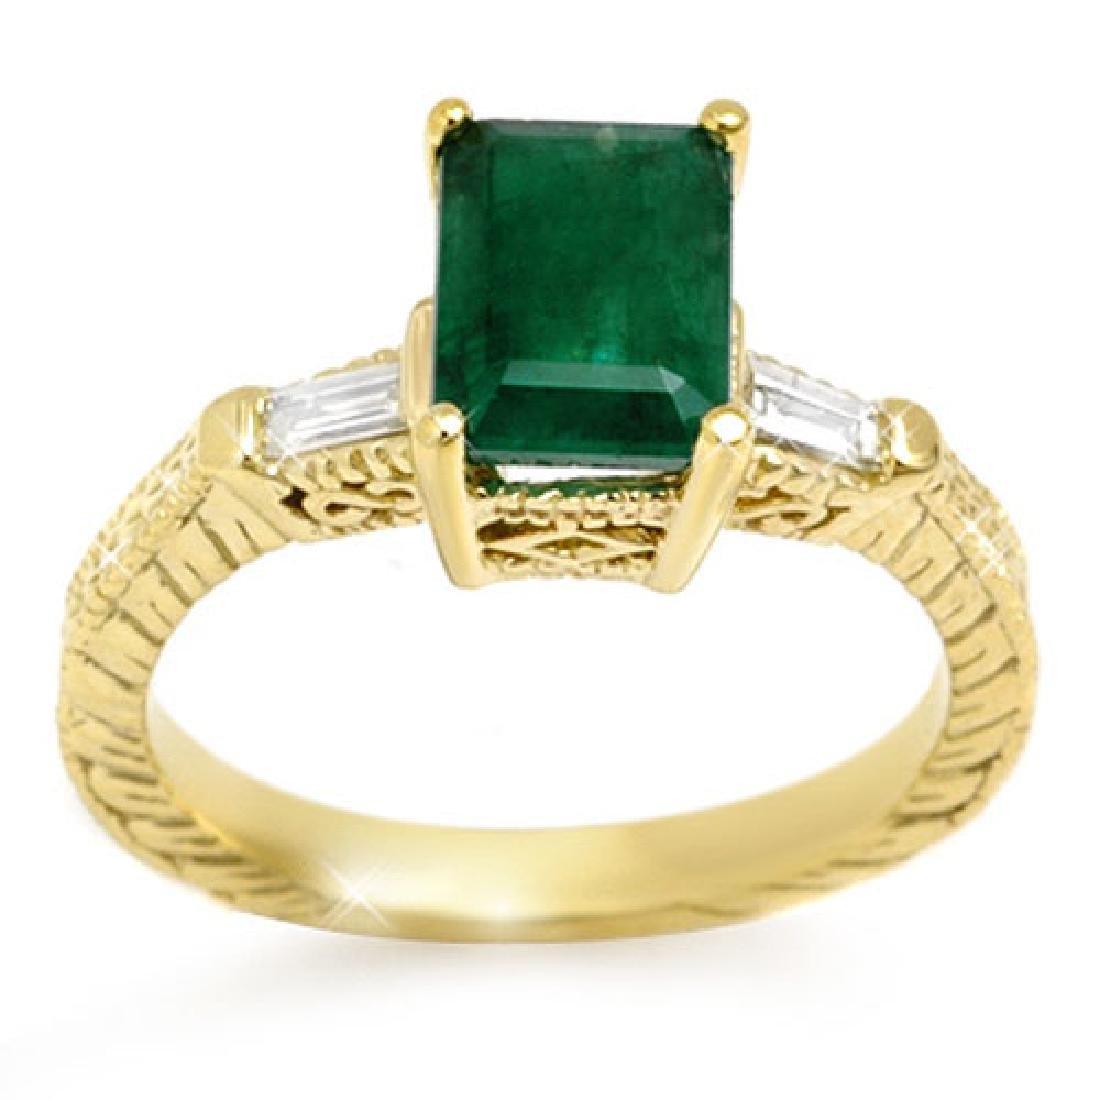 2.45 CTW Emerald & Diamond Ring 10K Yellow Gold